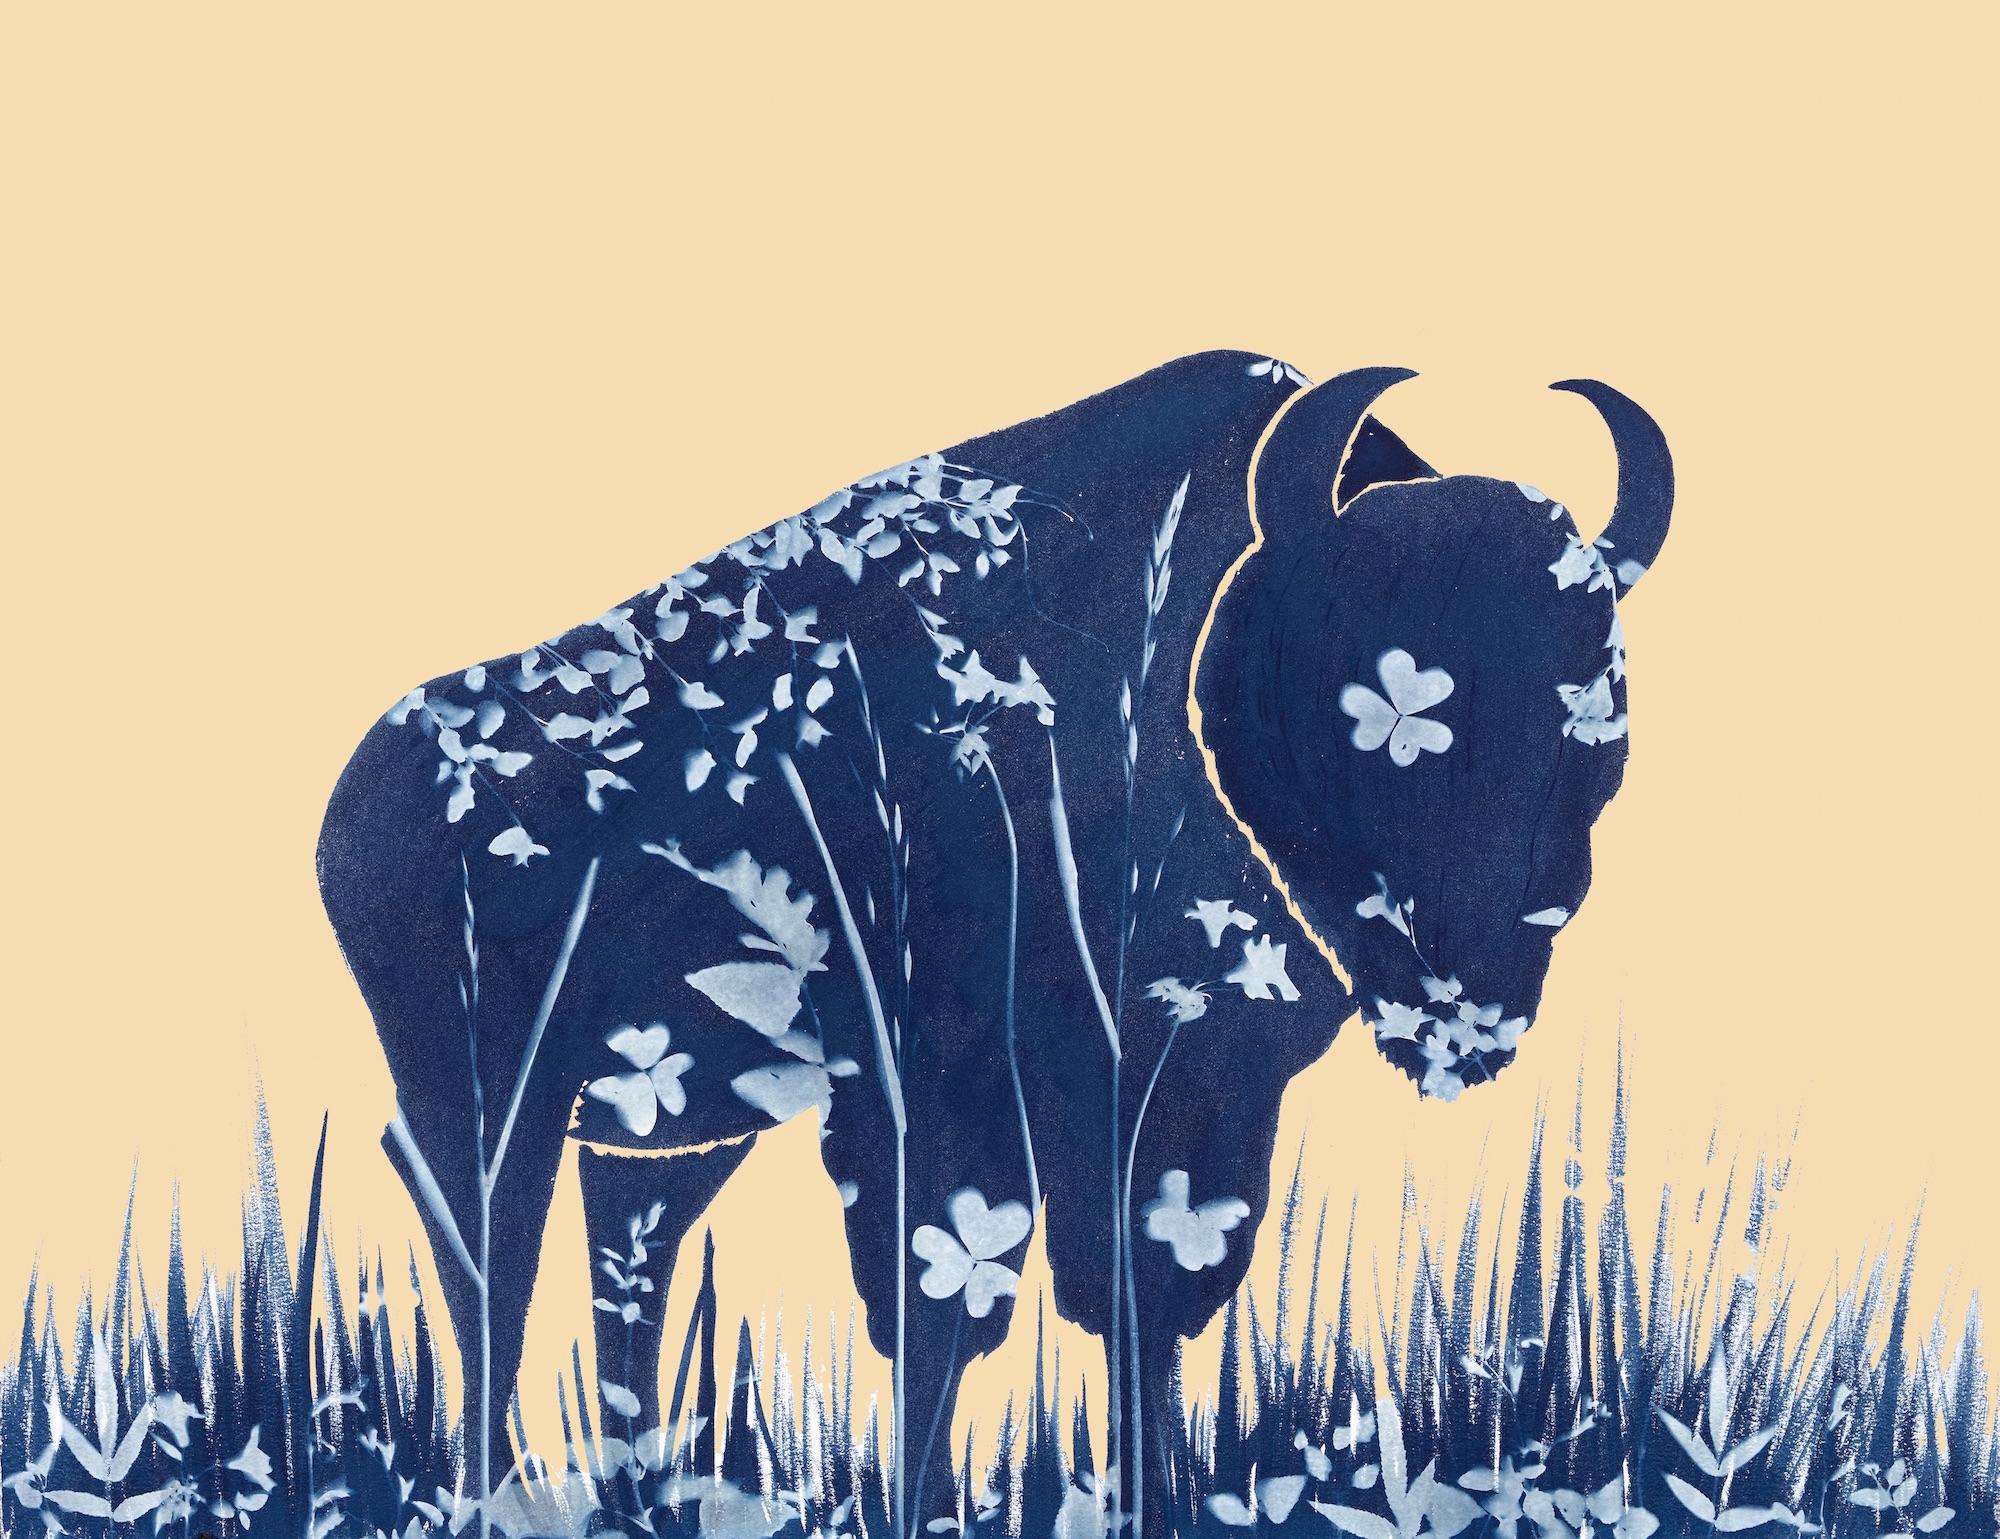 le_petite_bison_Brooke_Sauer.jpg